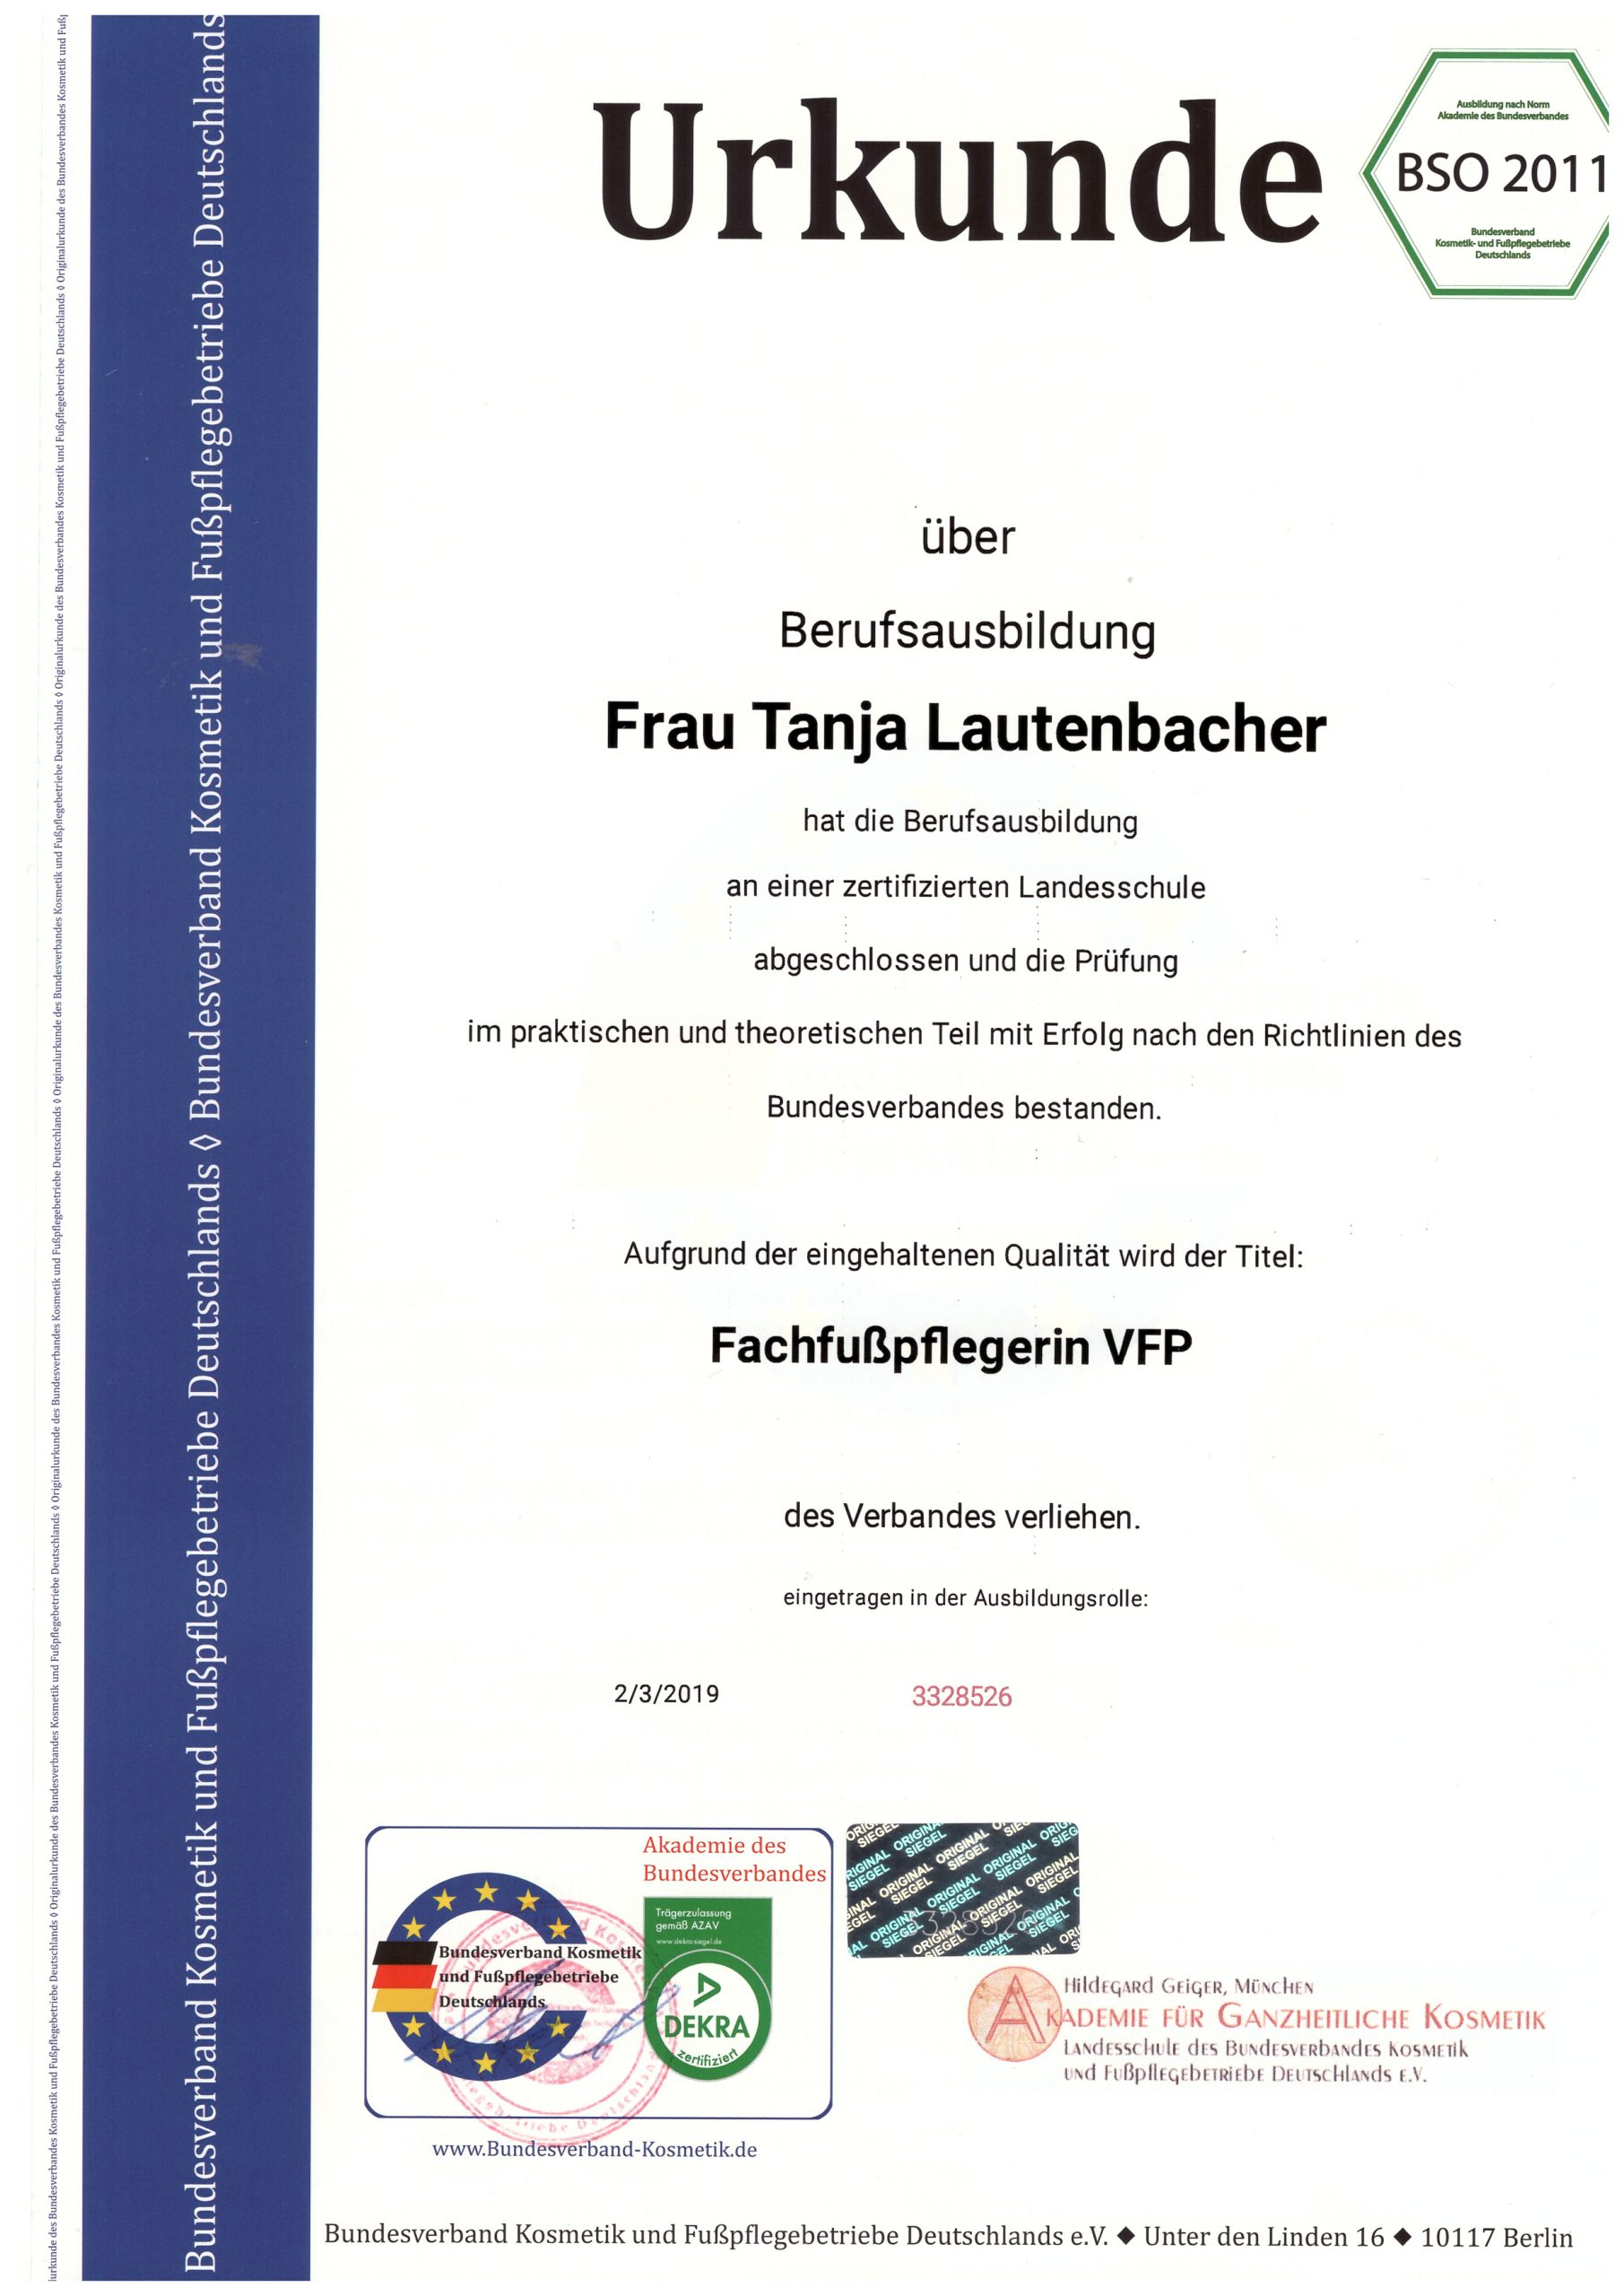 Tanja Lautenbacher - Ausbildungsurkunde Fußpflegerin VFP